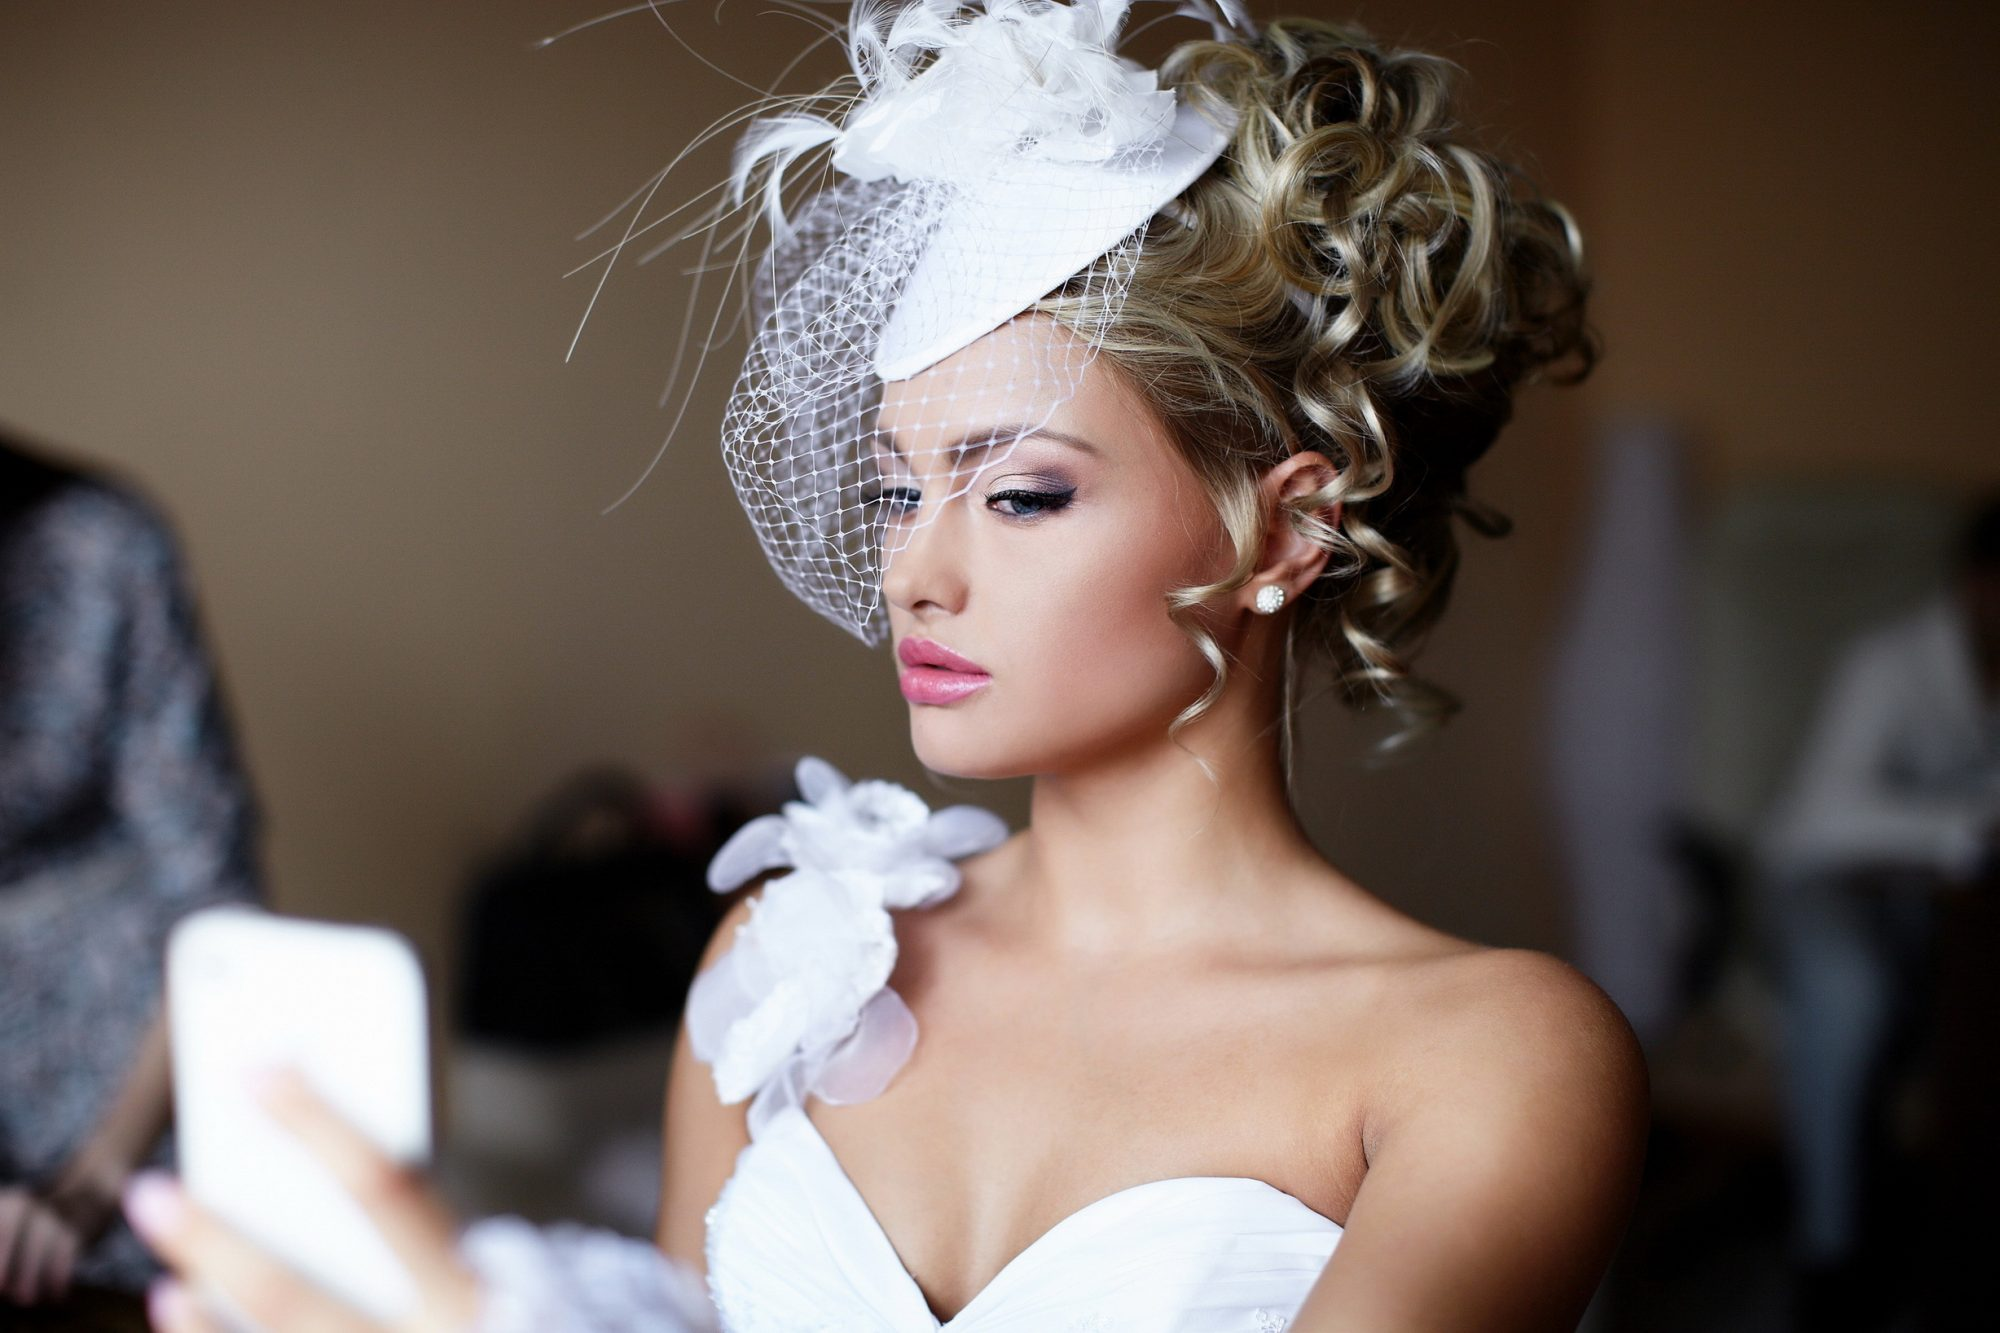 woman wearing birdcage wedding veil